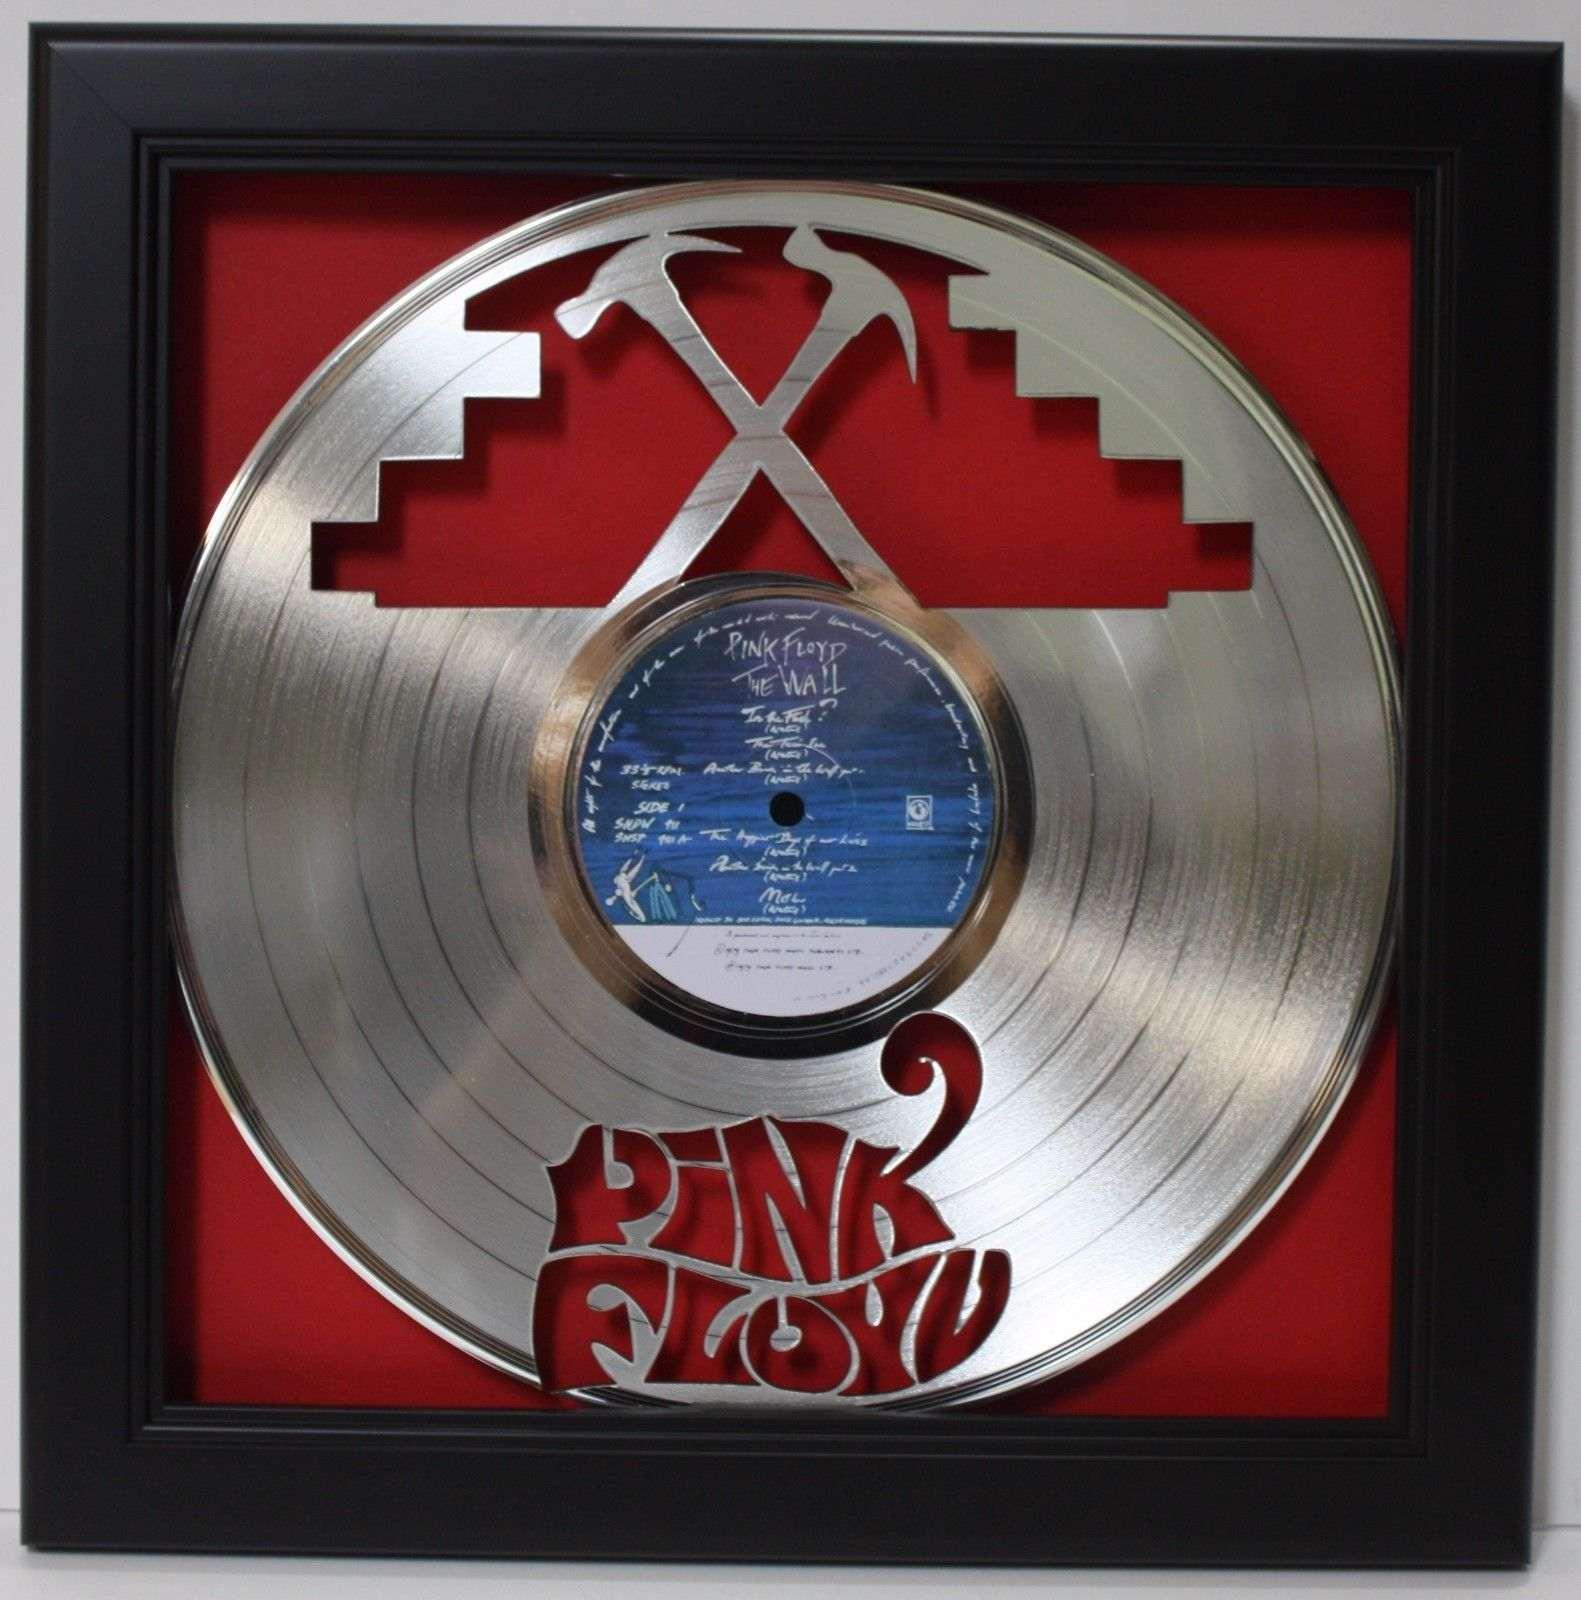 PINK FLOYD LTD Edition Poster Art Platinum Record Memorabilia Gift Free Shipping